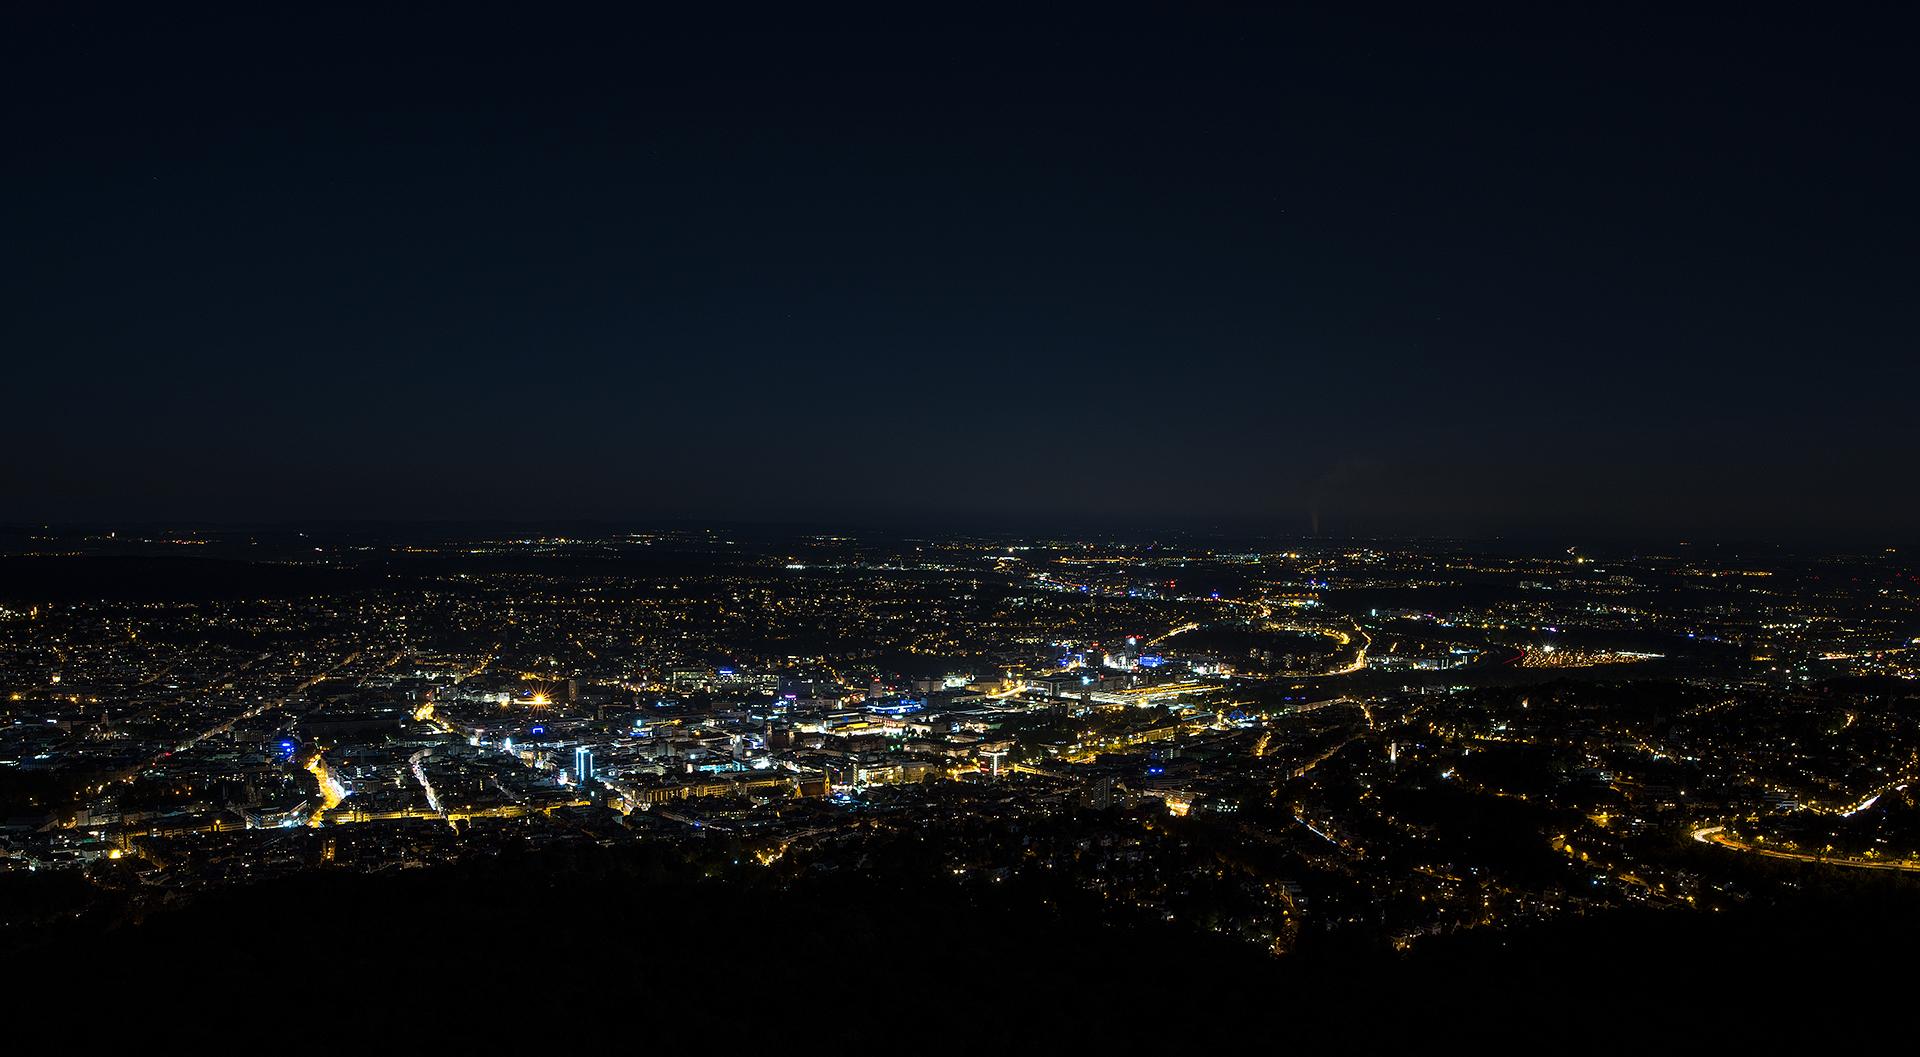 Stuttgart Nacht 2016